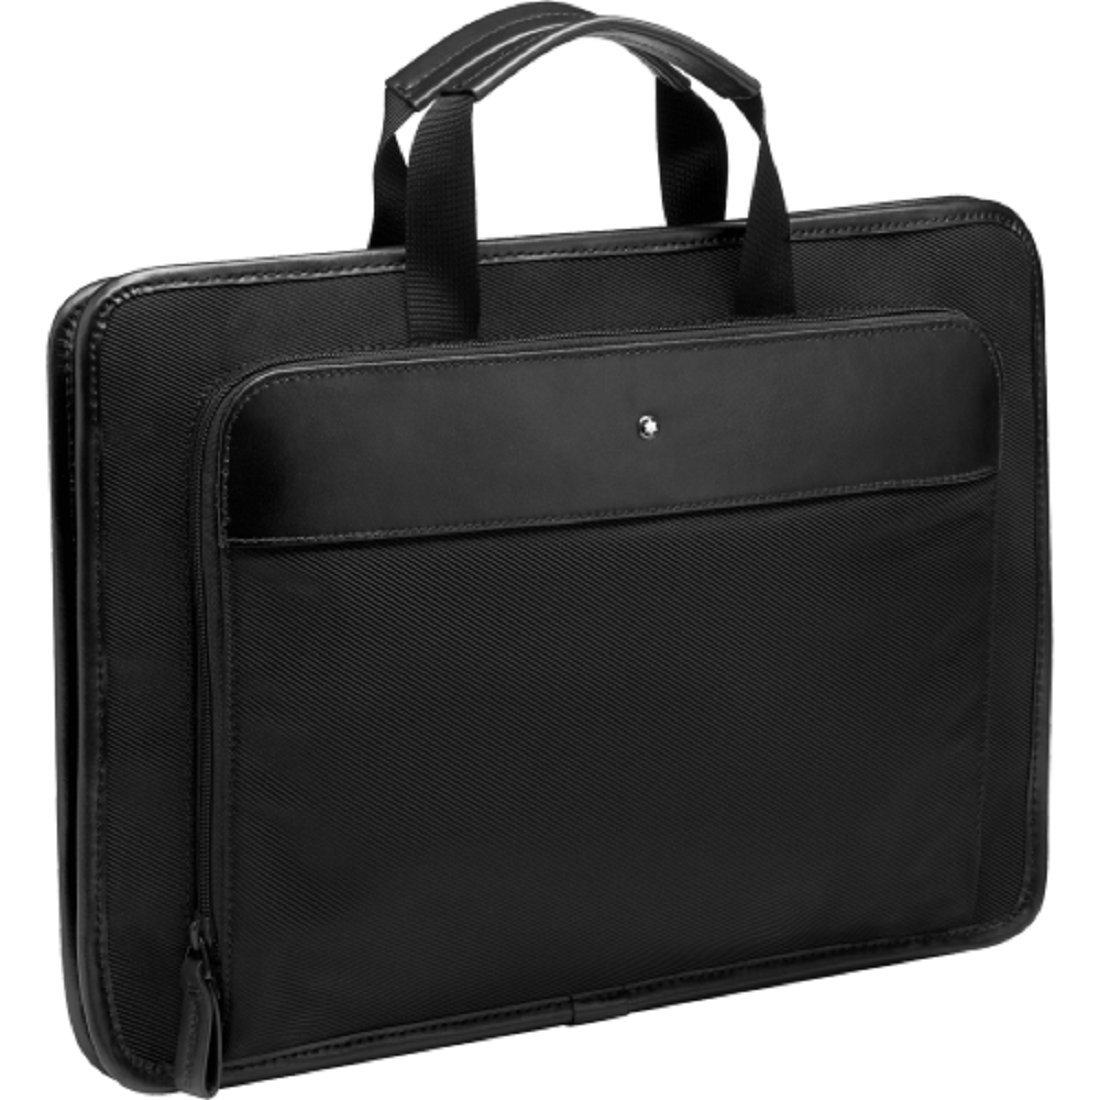 Montblanc NightFlight Laptop Case Black 116775